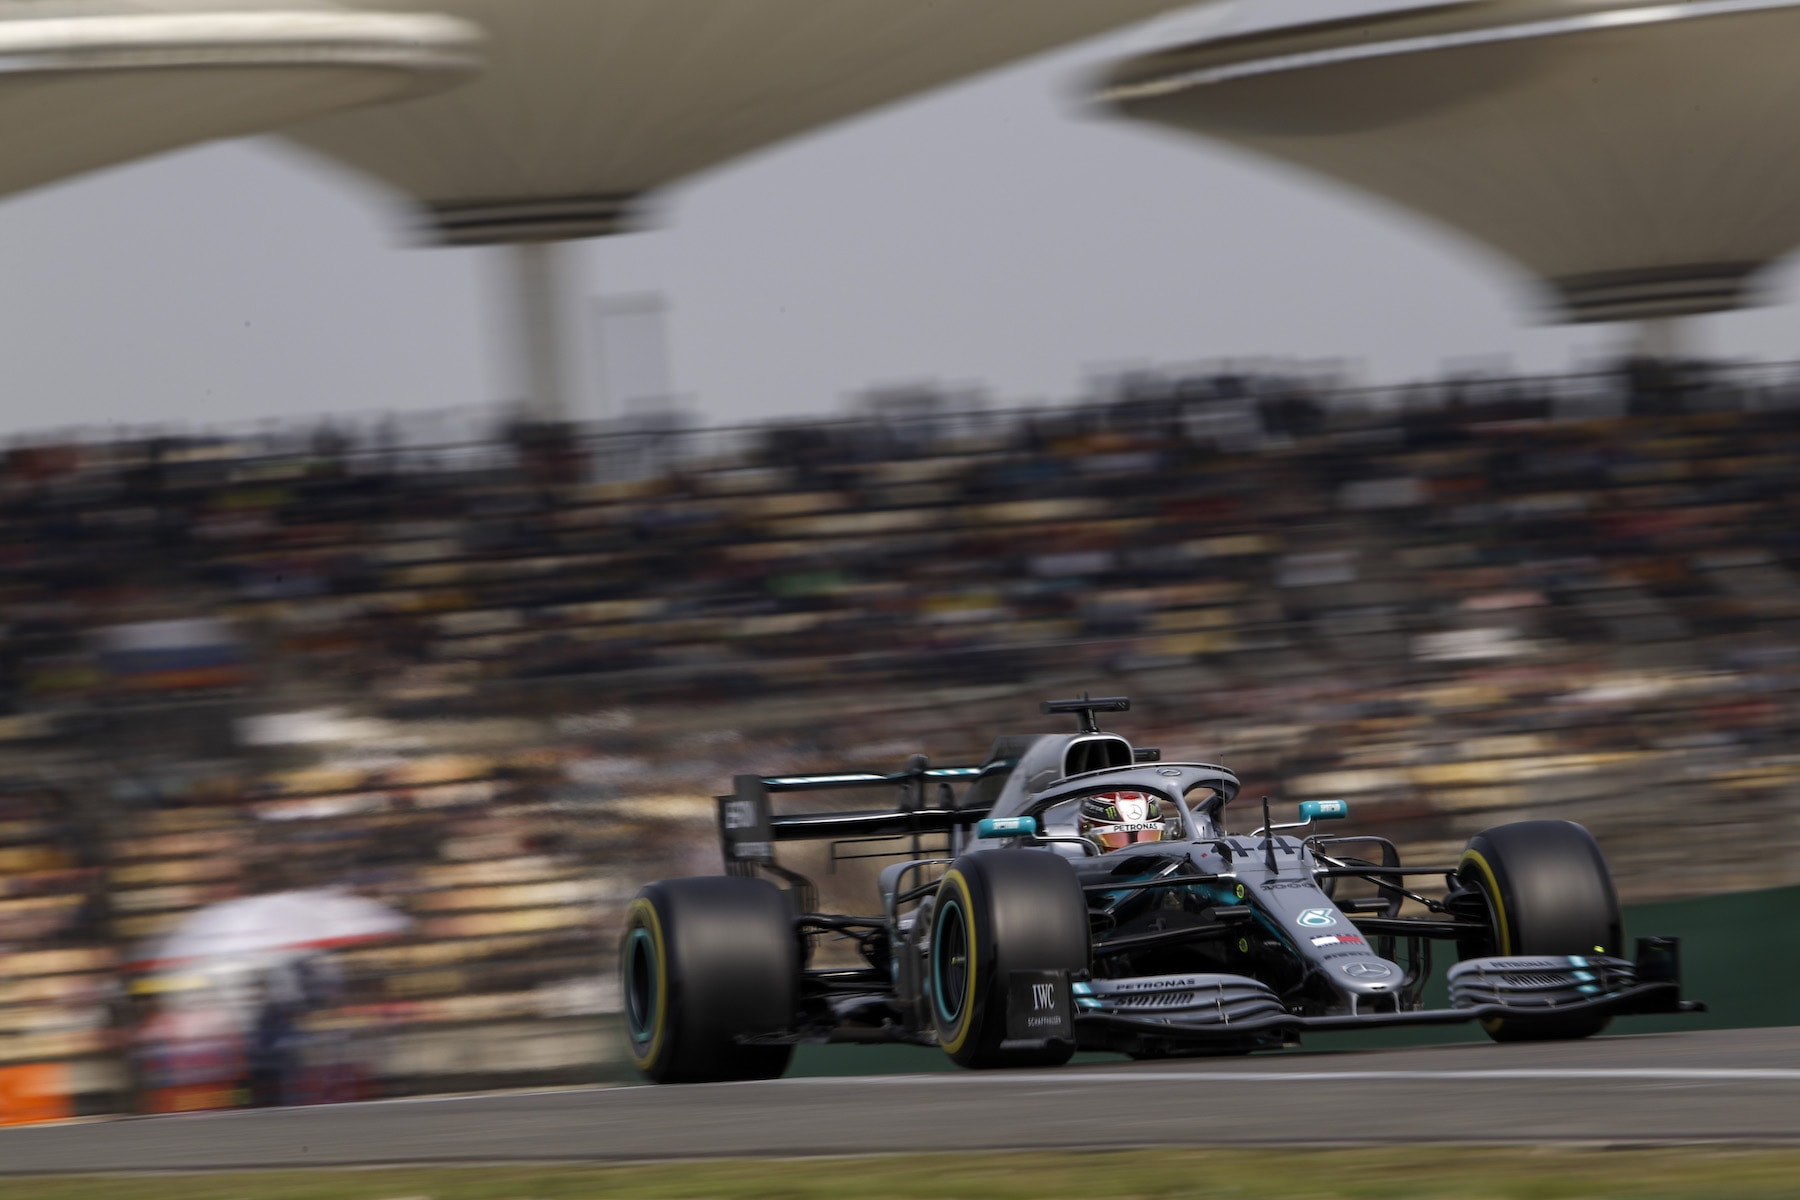 2 2019 Lewis Hamilton | Mercedes W10 | 2019 Chinese GP Q 2 copy.JPG